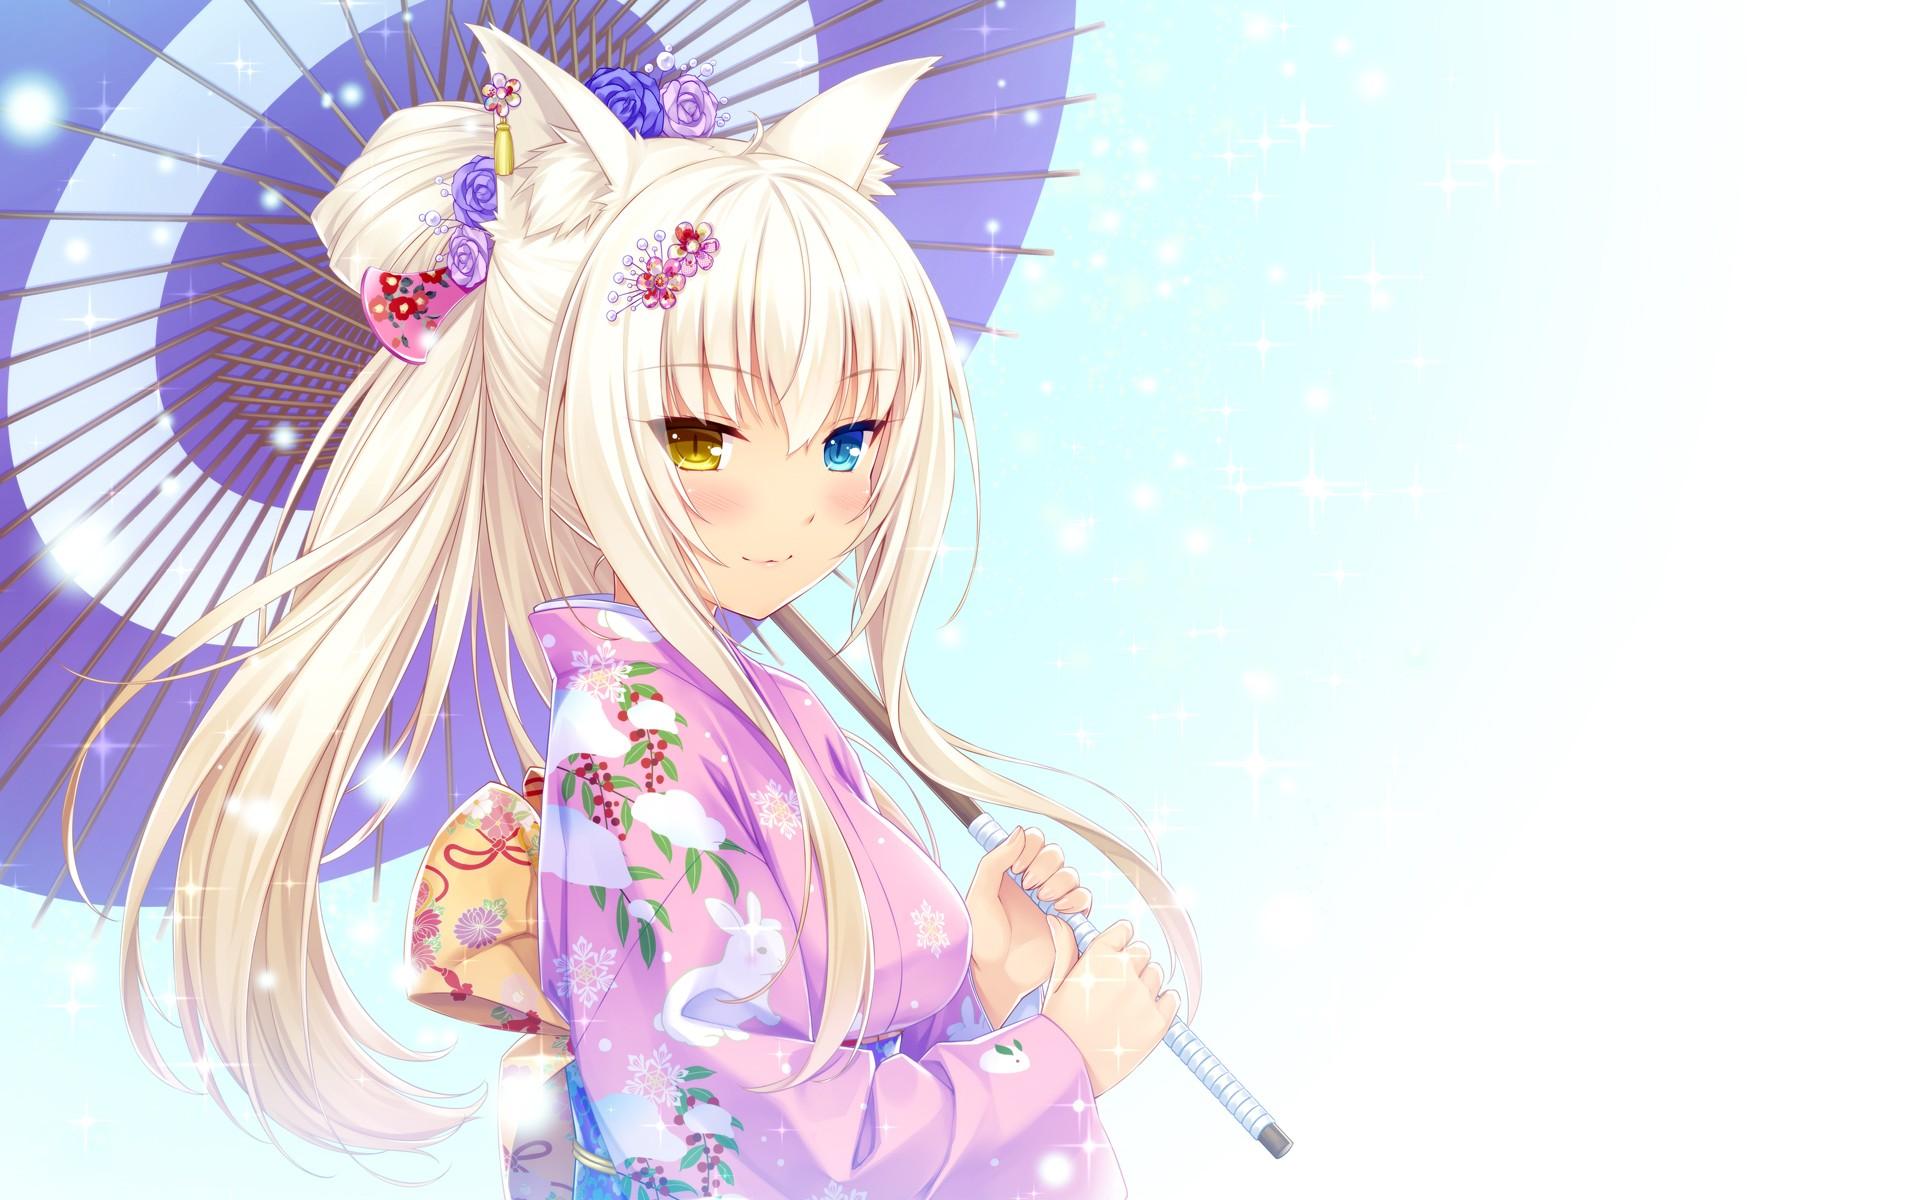 Illustration nekomimi anime anime girls cat girl animal ears umbrella heterochromia kimono neko para coconut neko